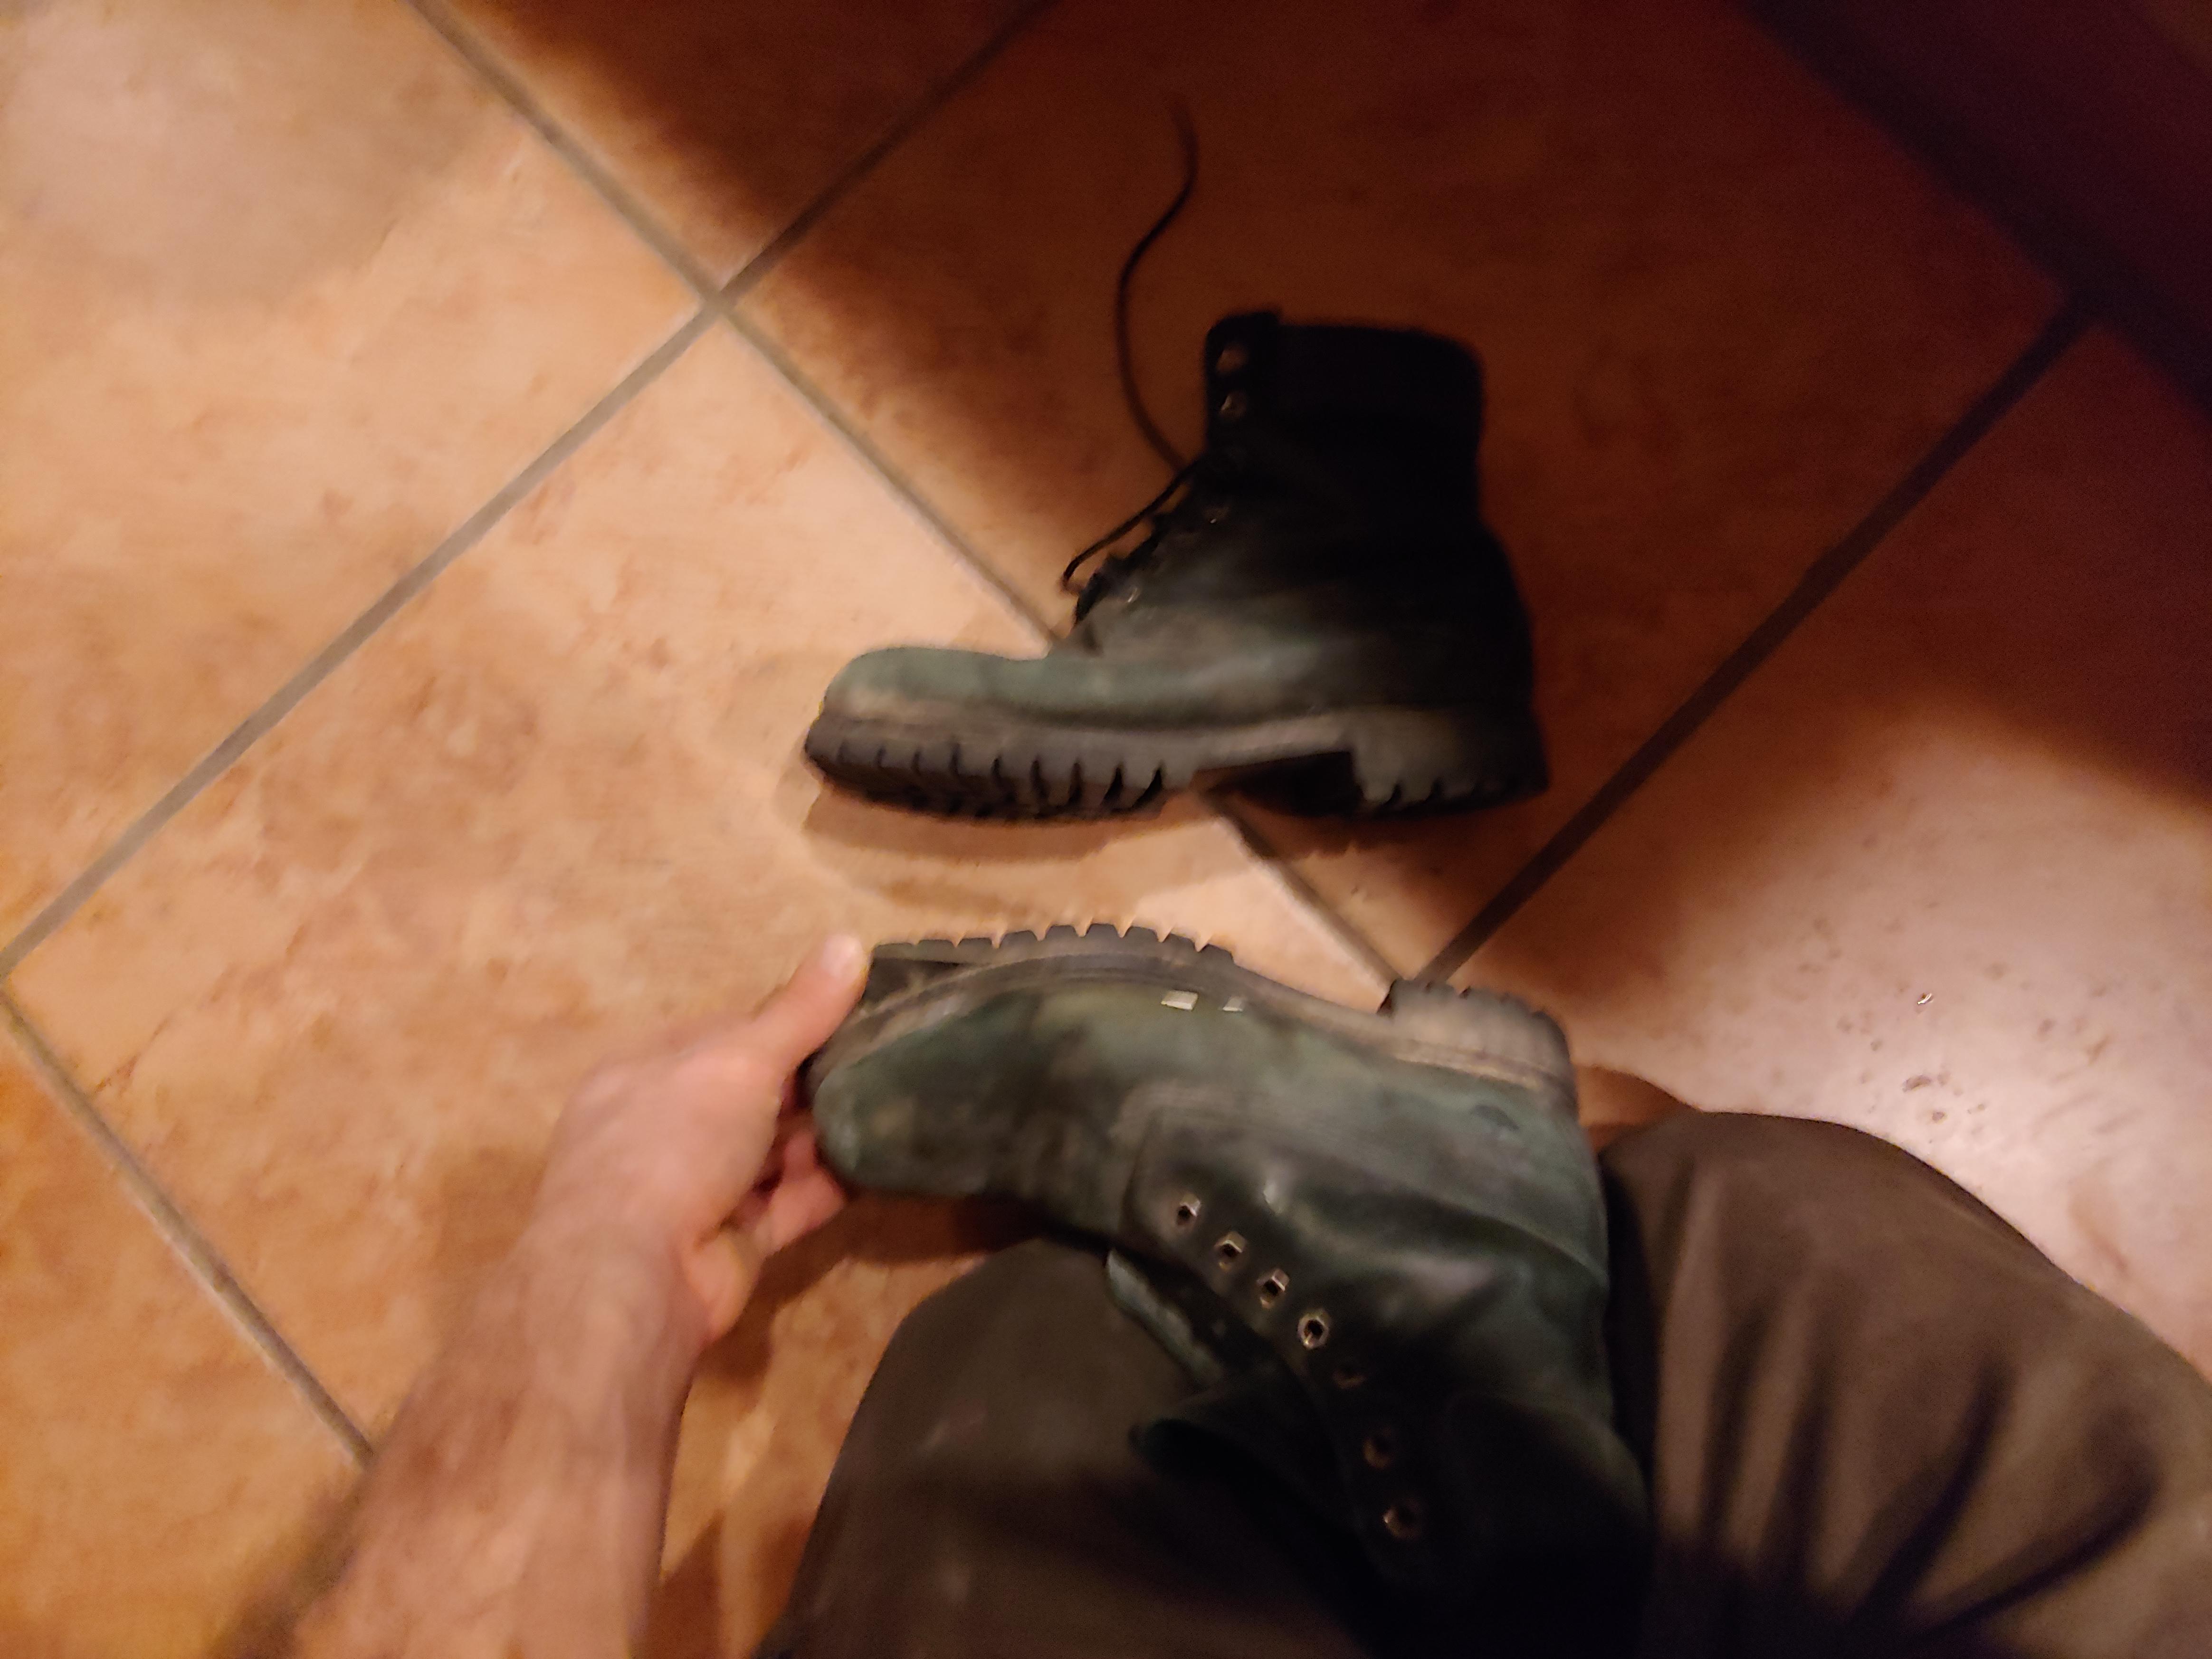 Timberland Shoes Reviews - 21 Reviews of Timberland.com  be58126072